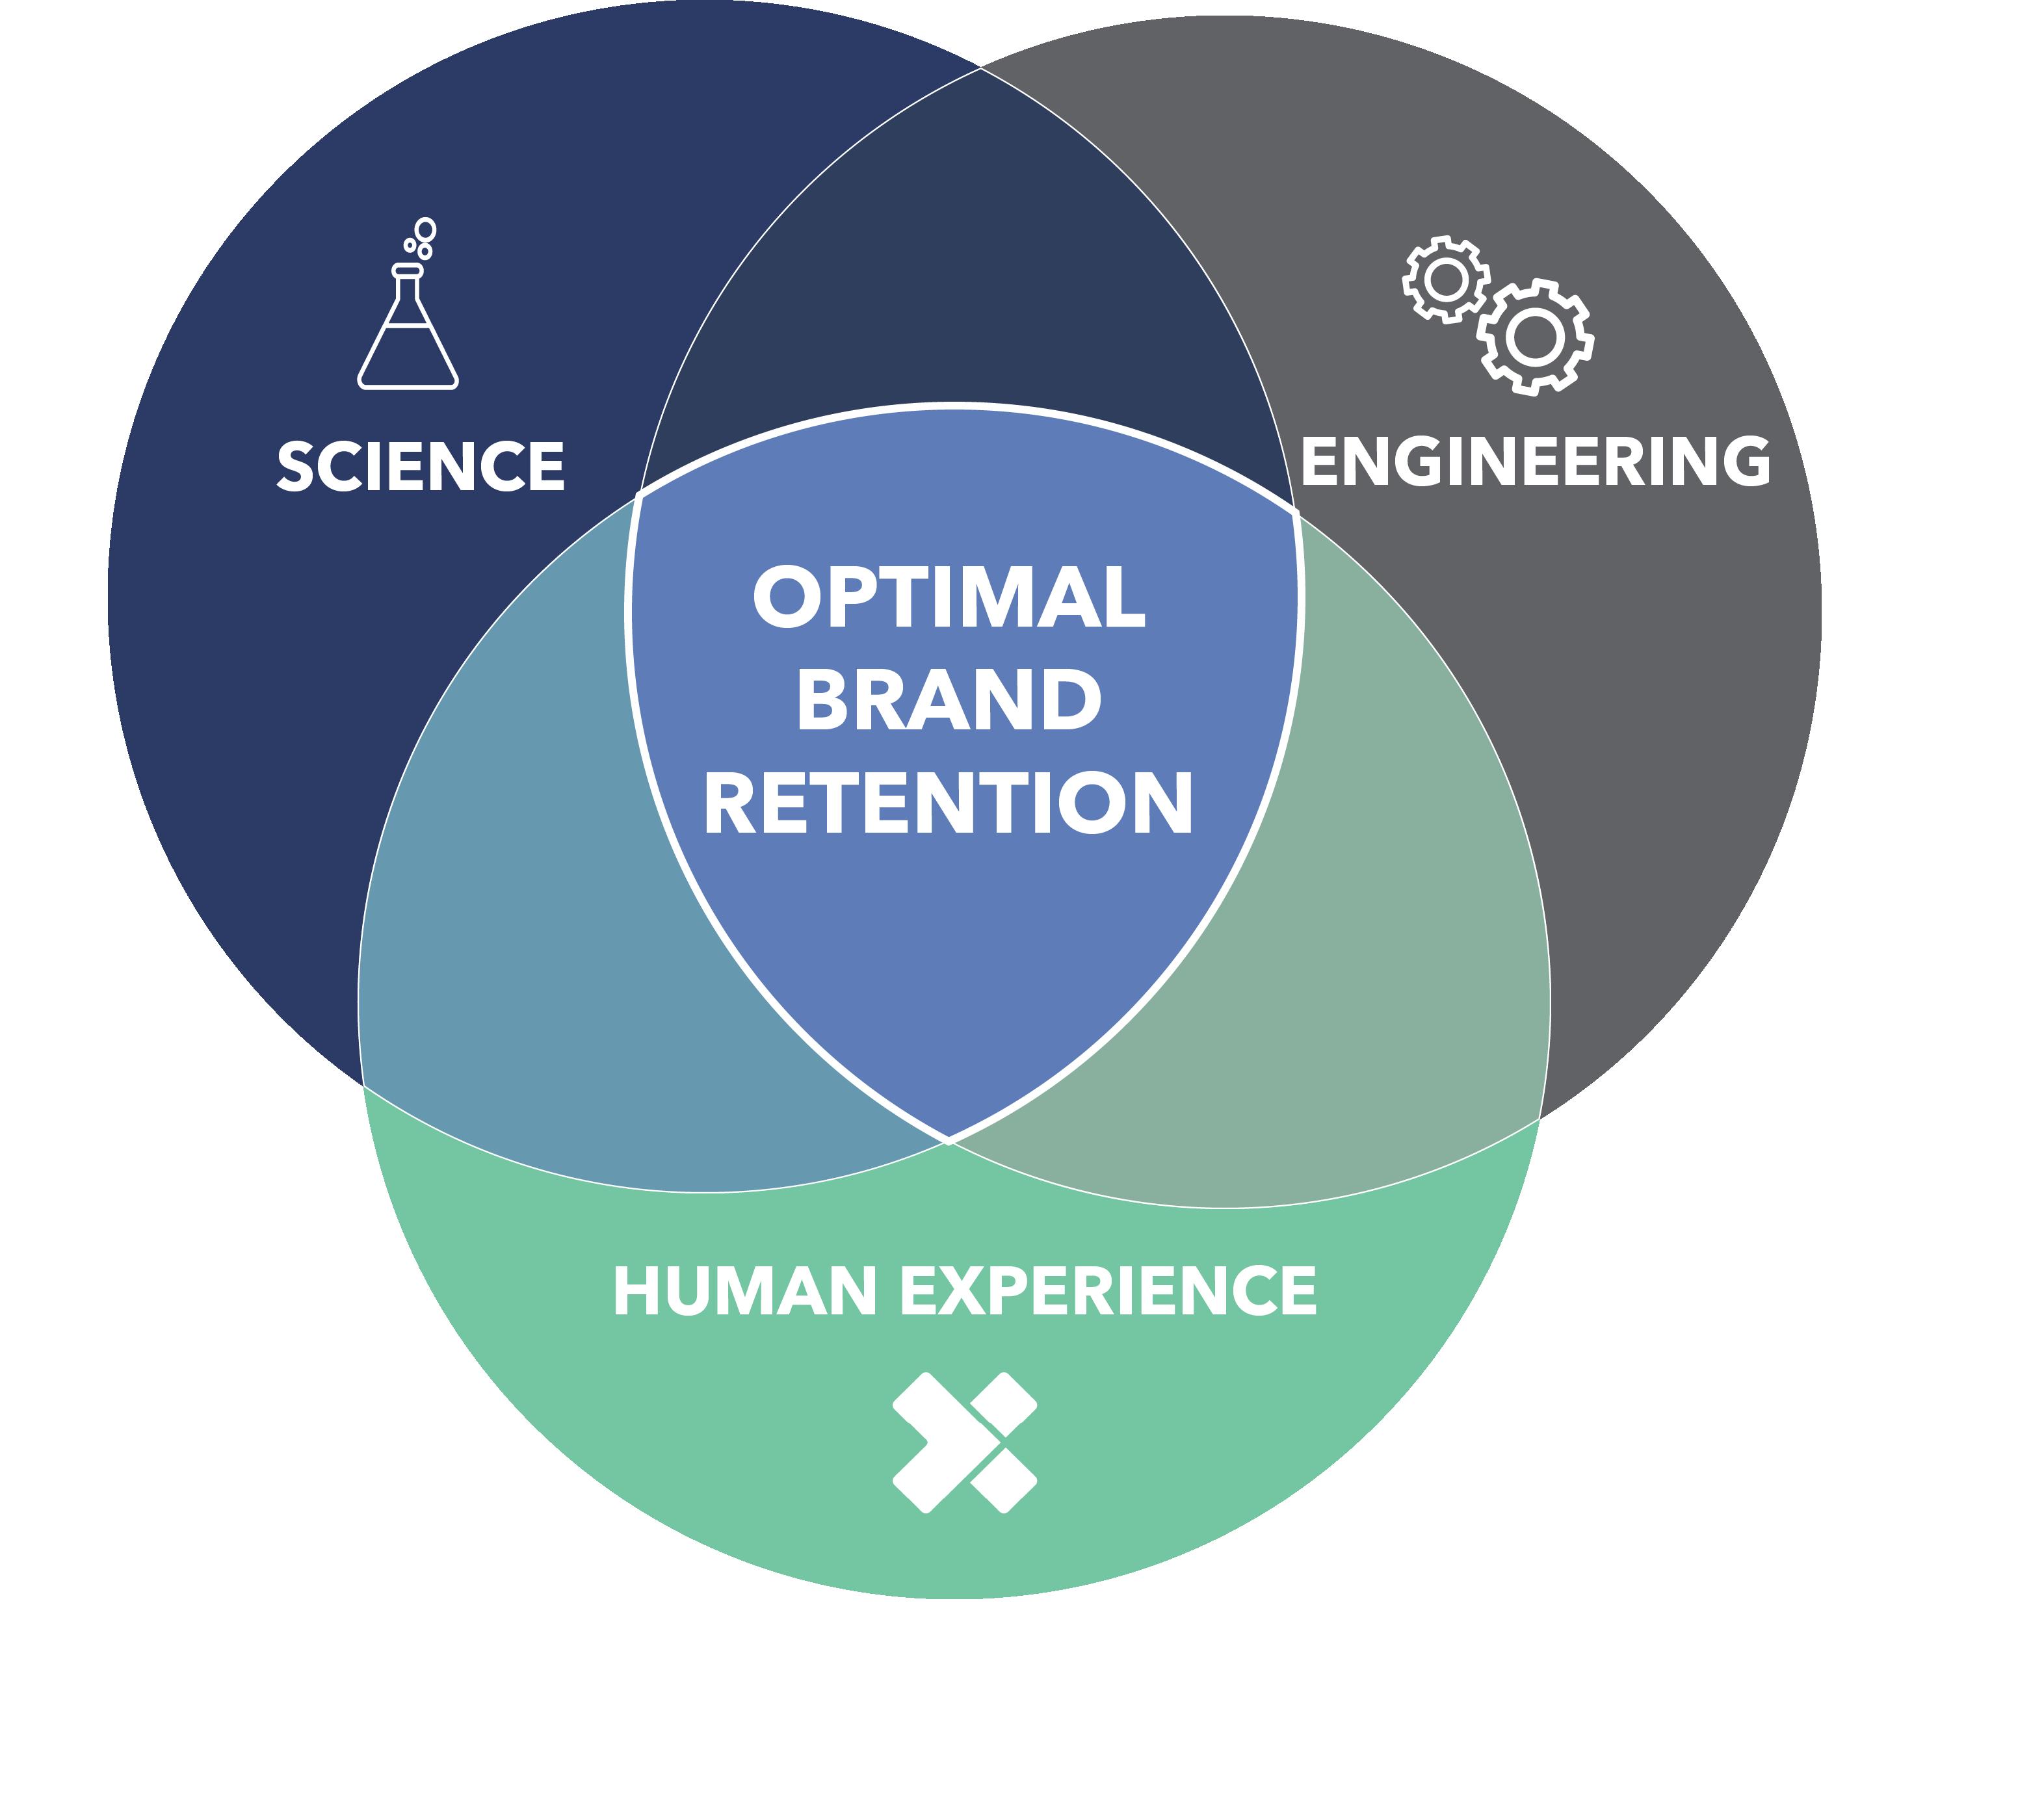 optimal brand retention